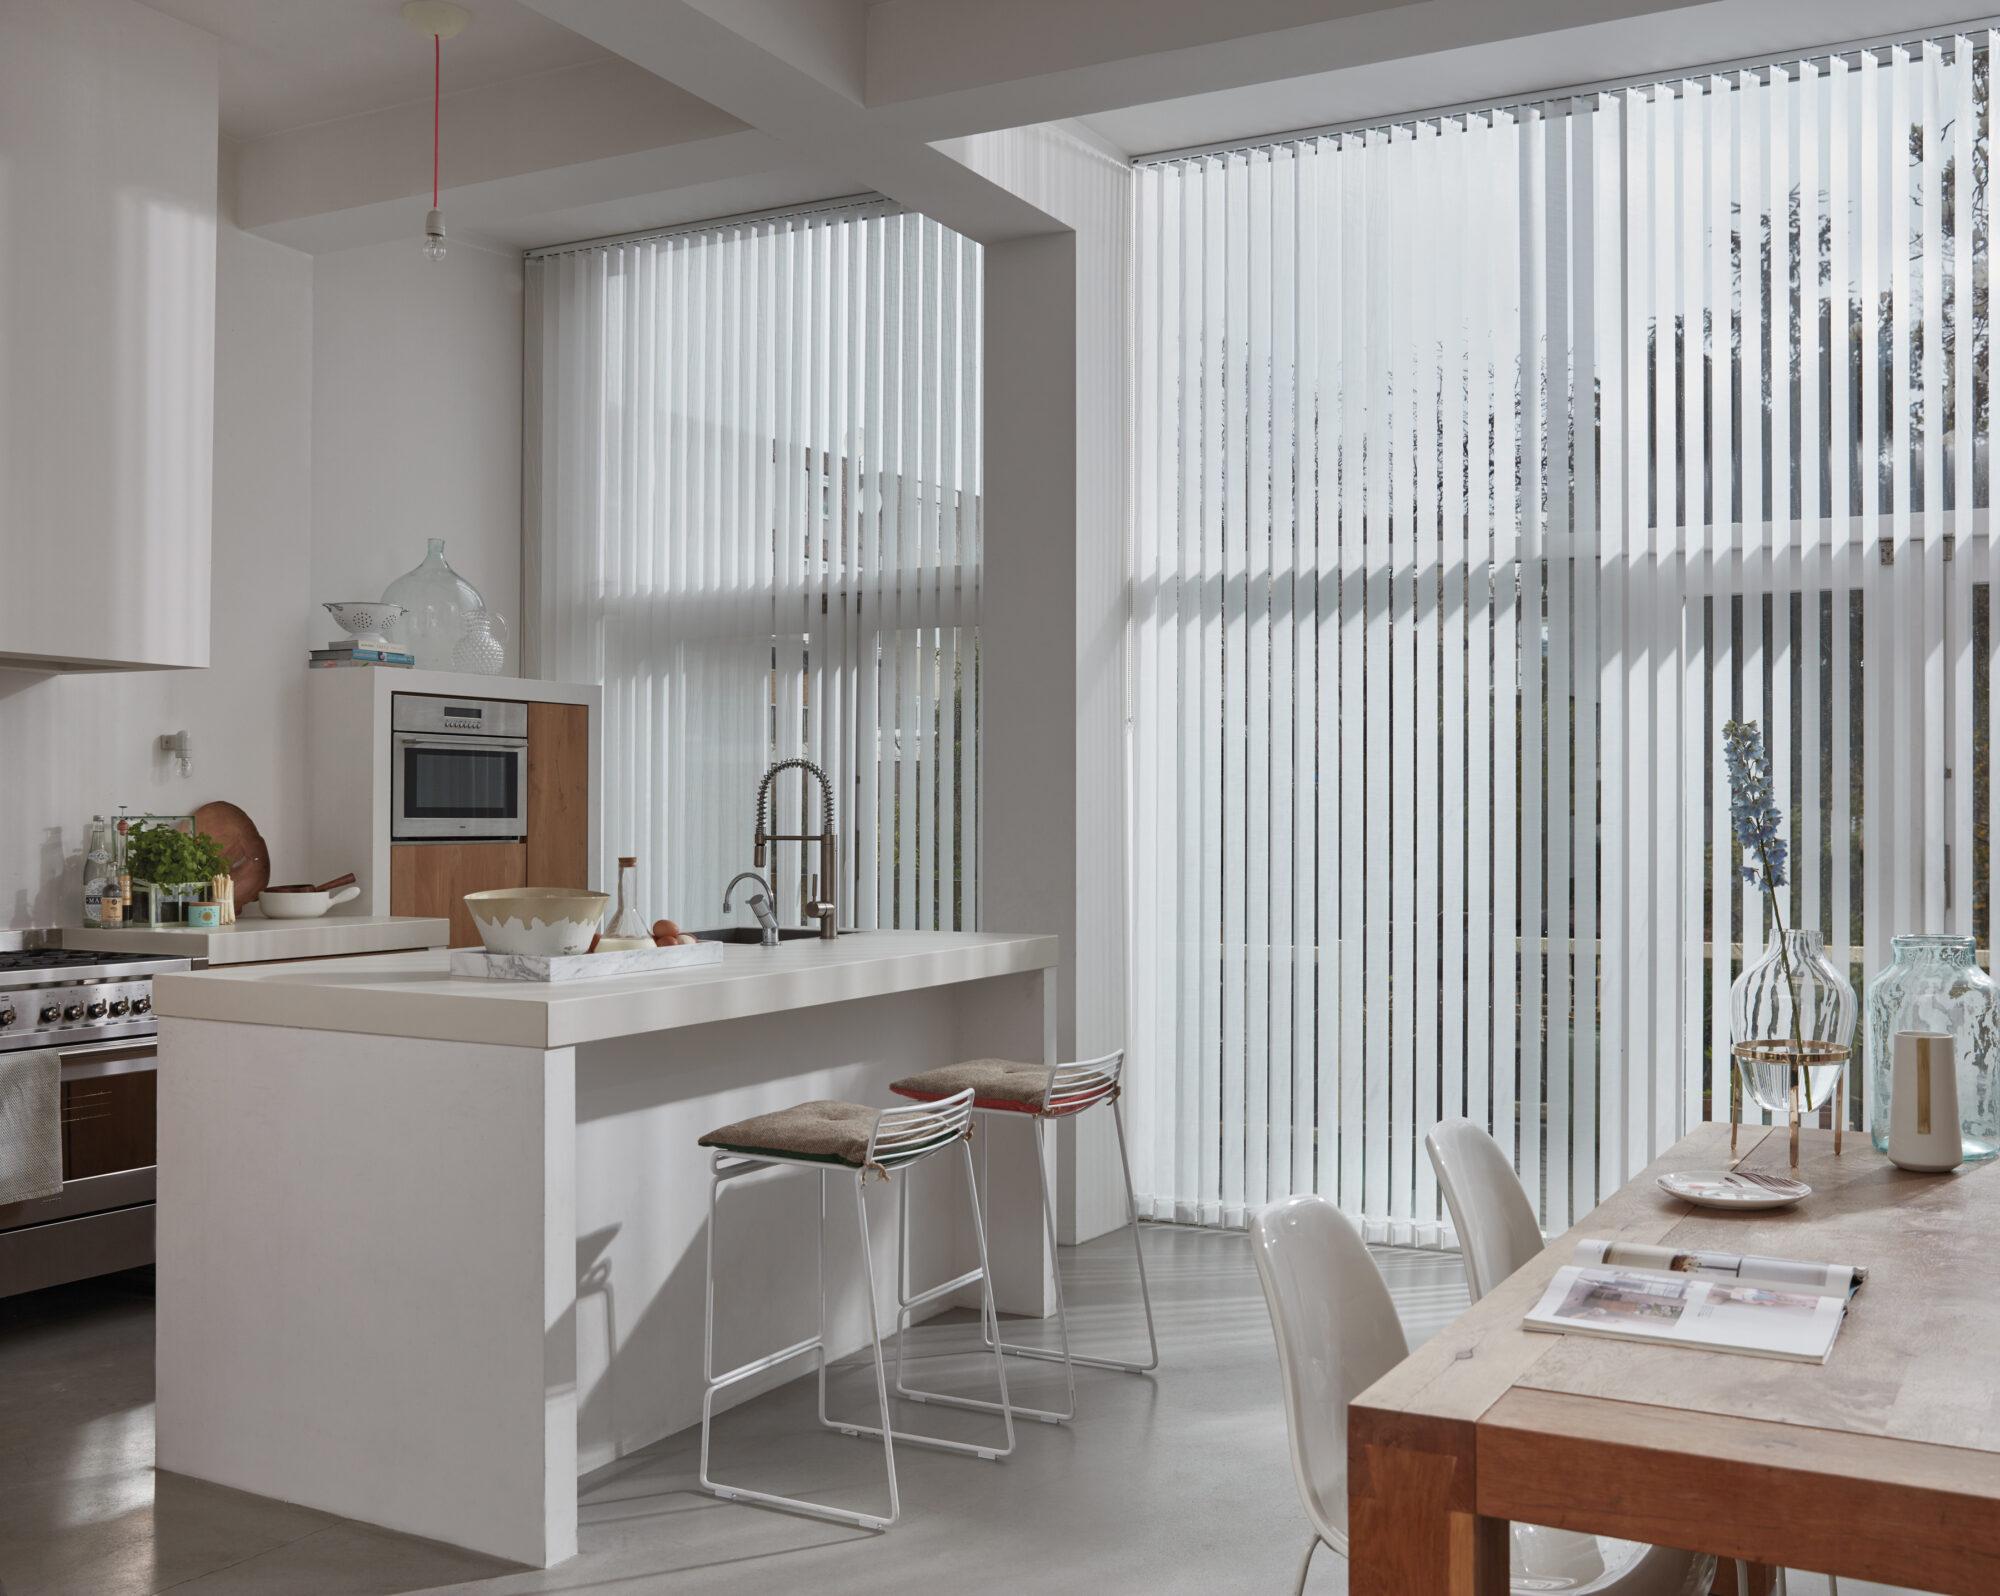 Verticale jaloezieën Luxaflex raamdecoratie